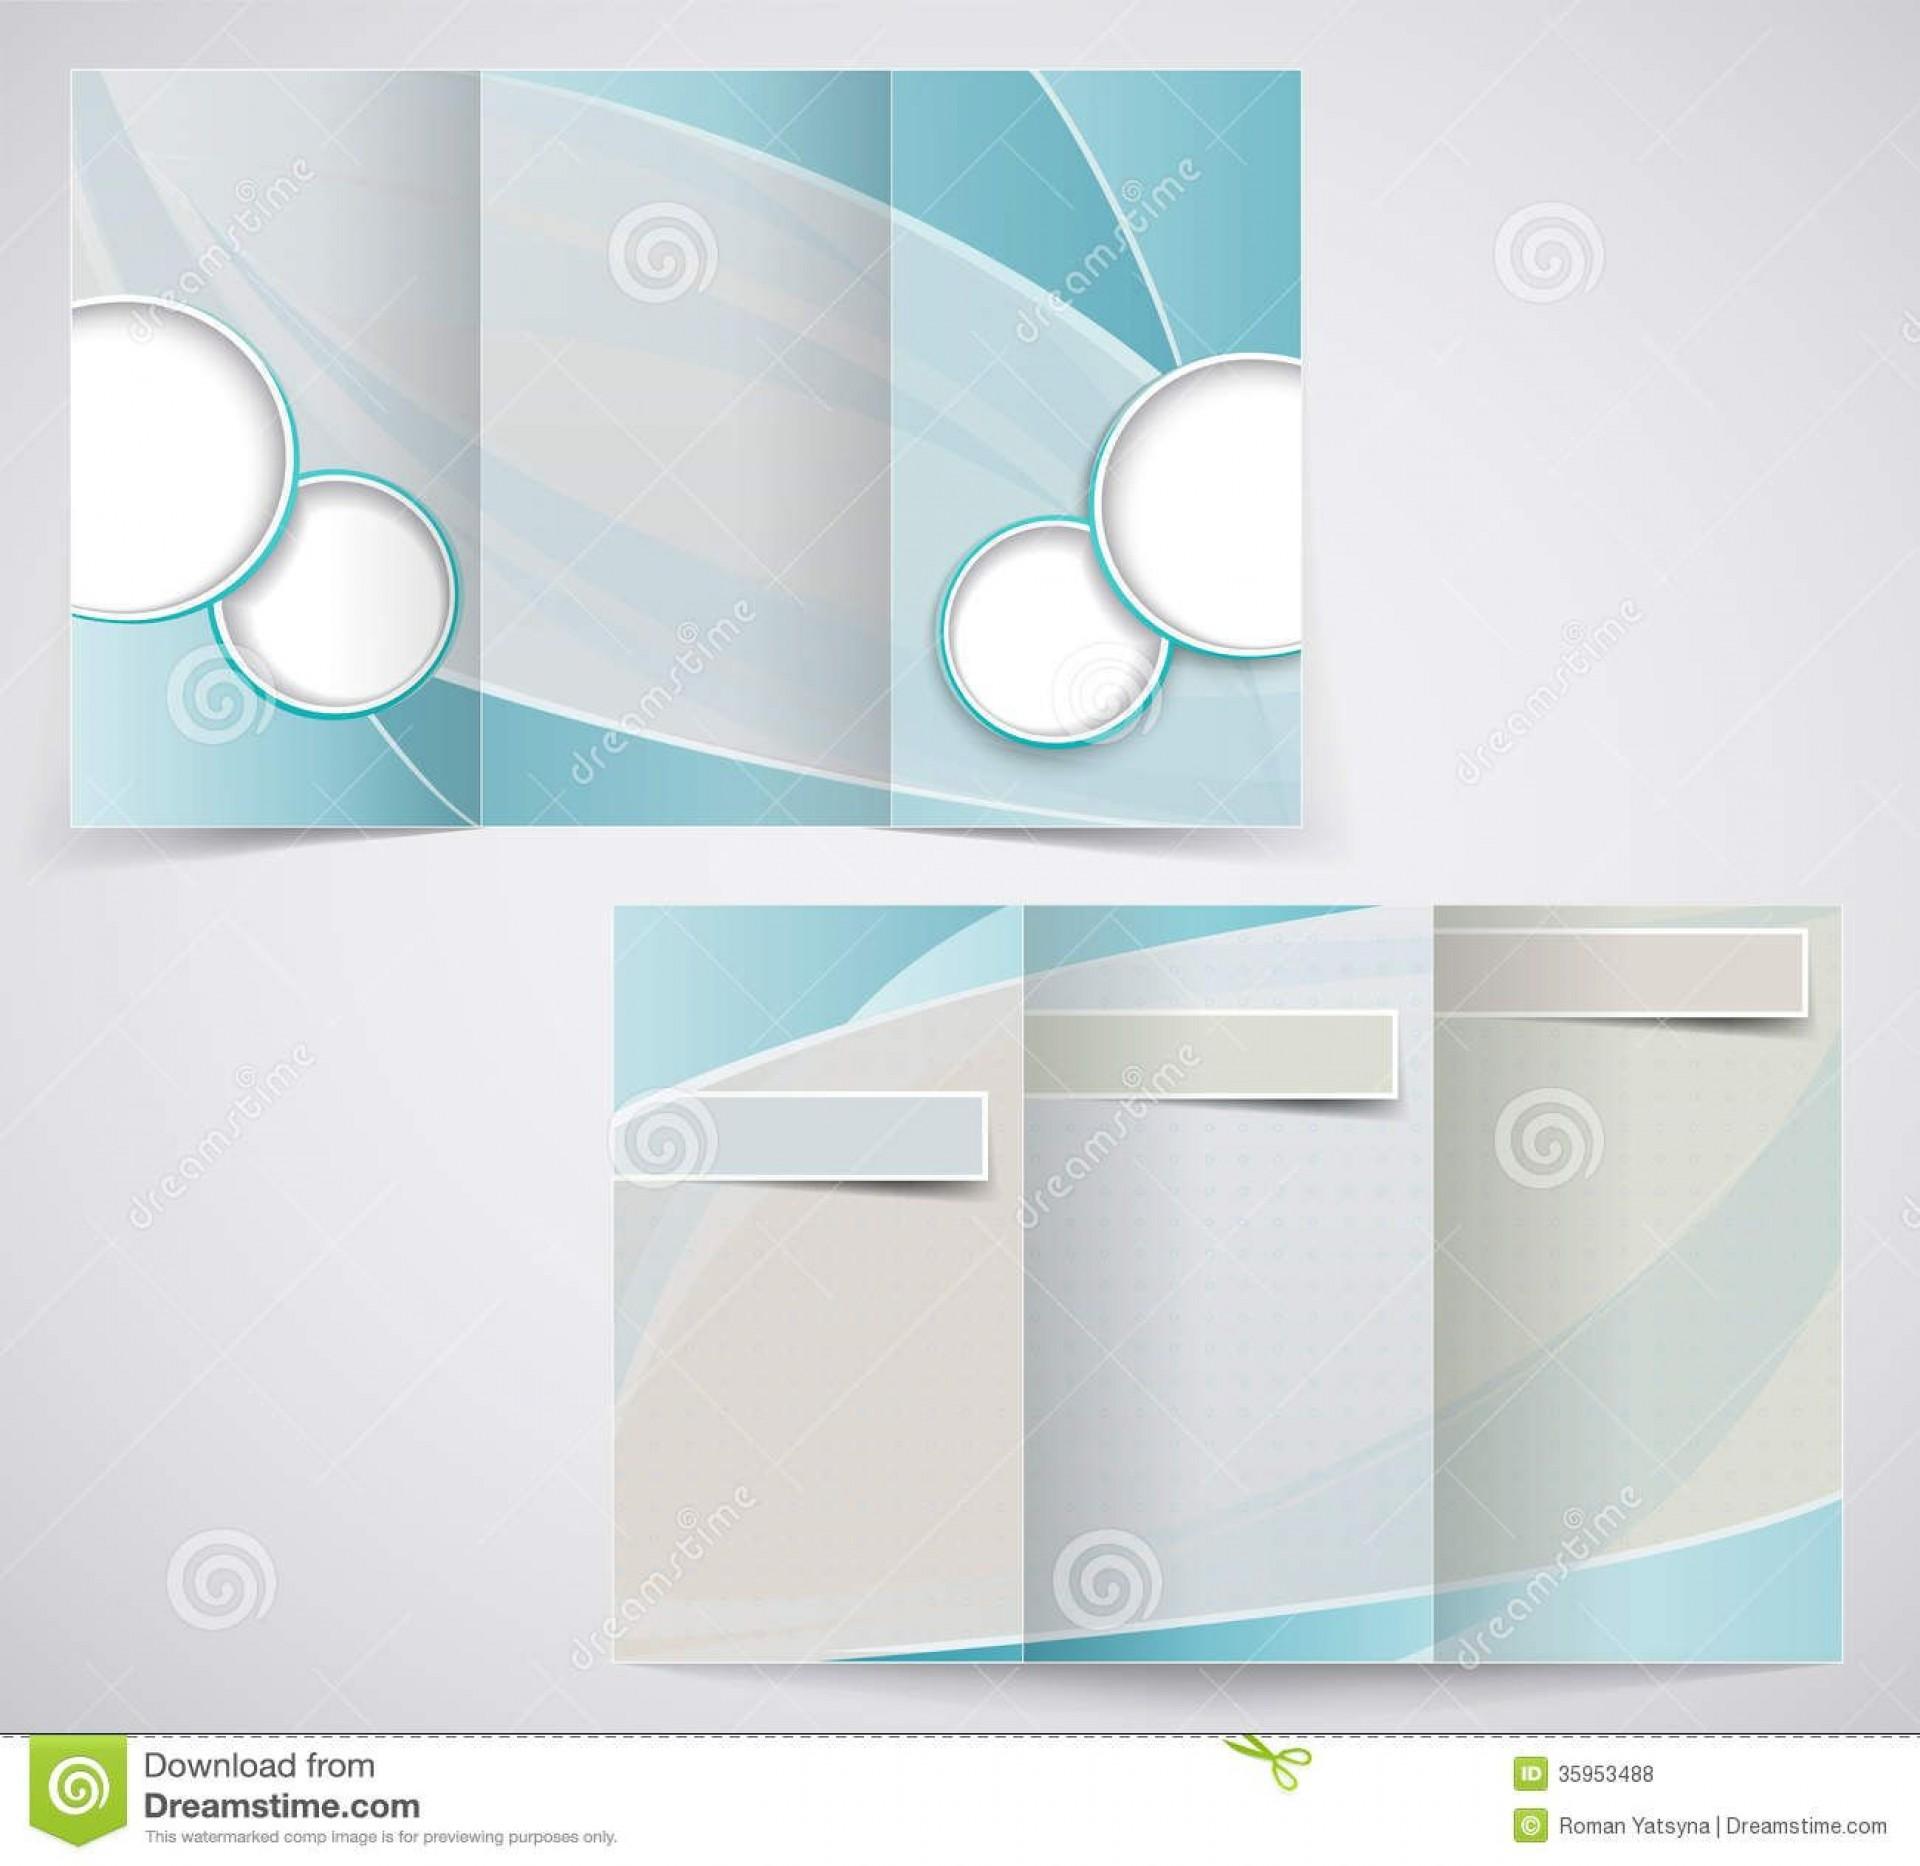 009 Fantastic Tri Fold Brochure Template Word High Resolution  2010 2007 Free1920